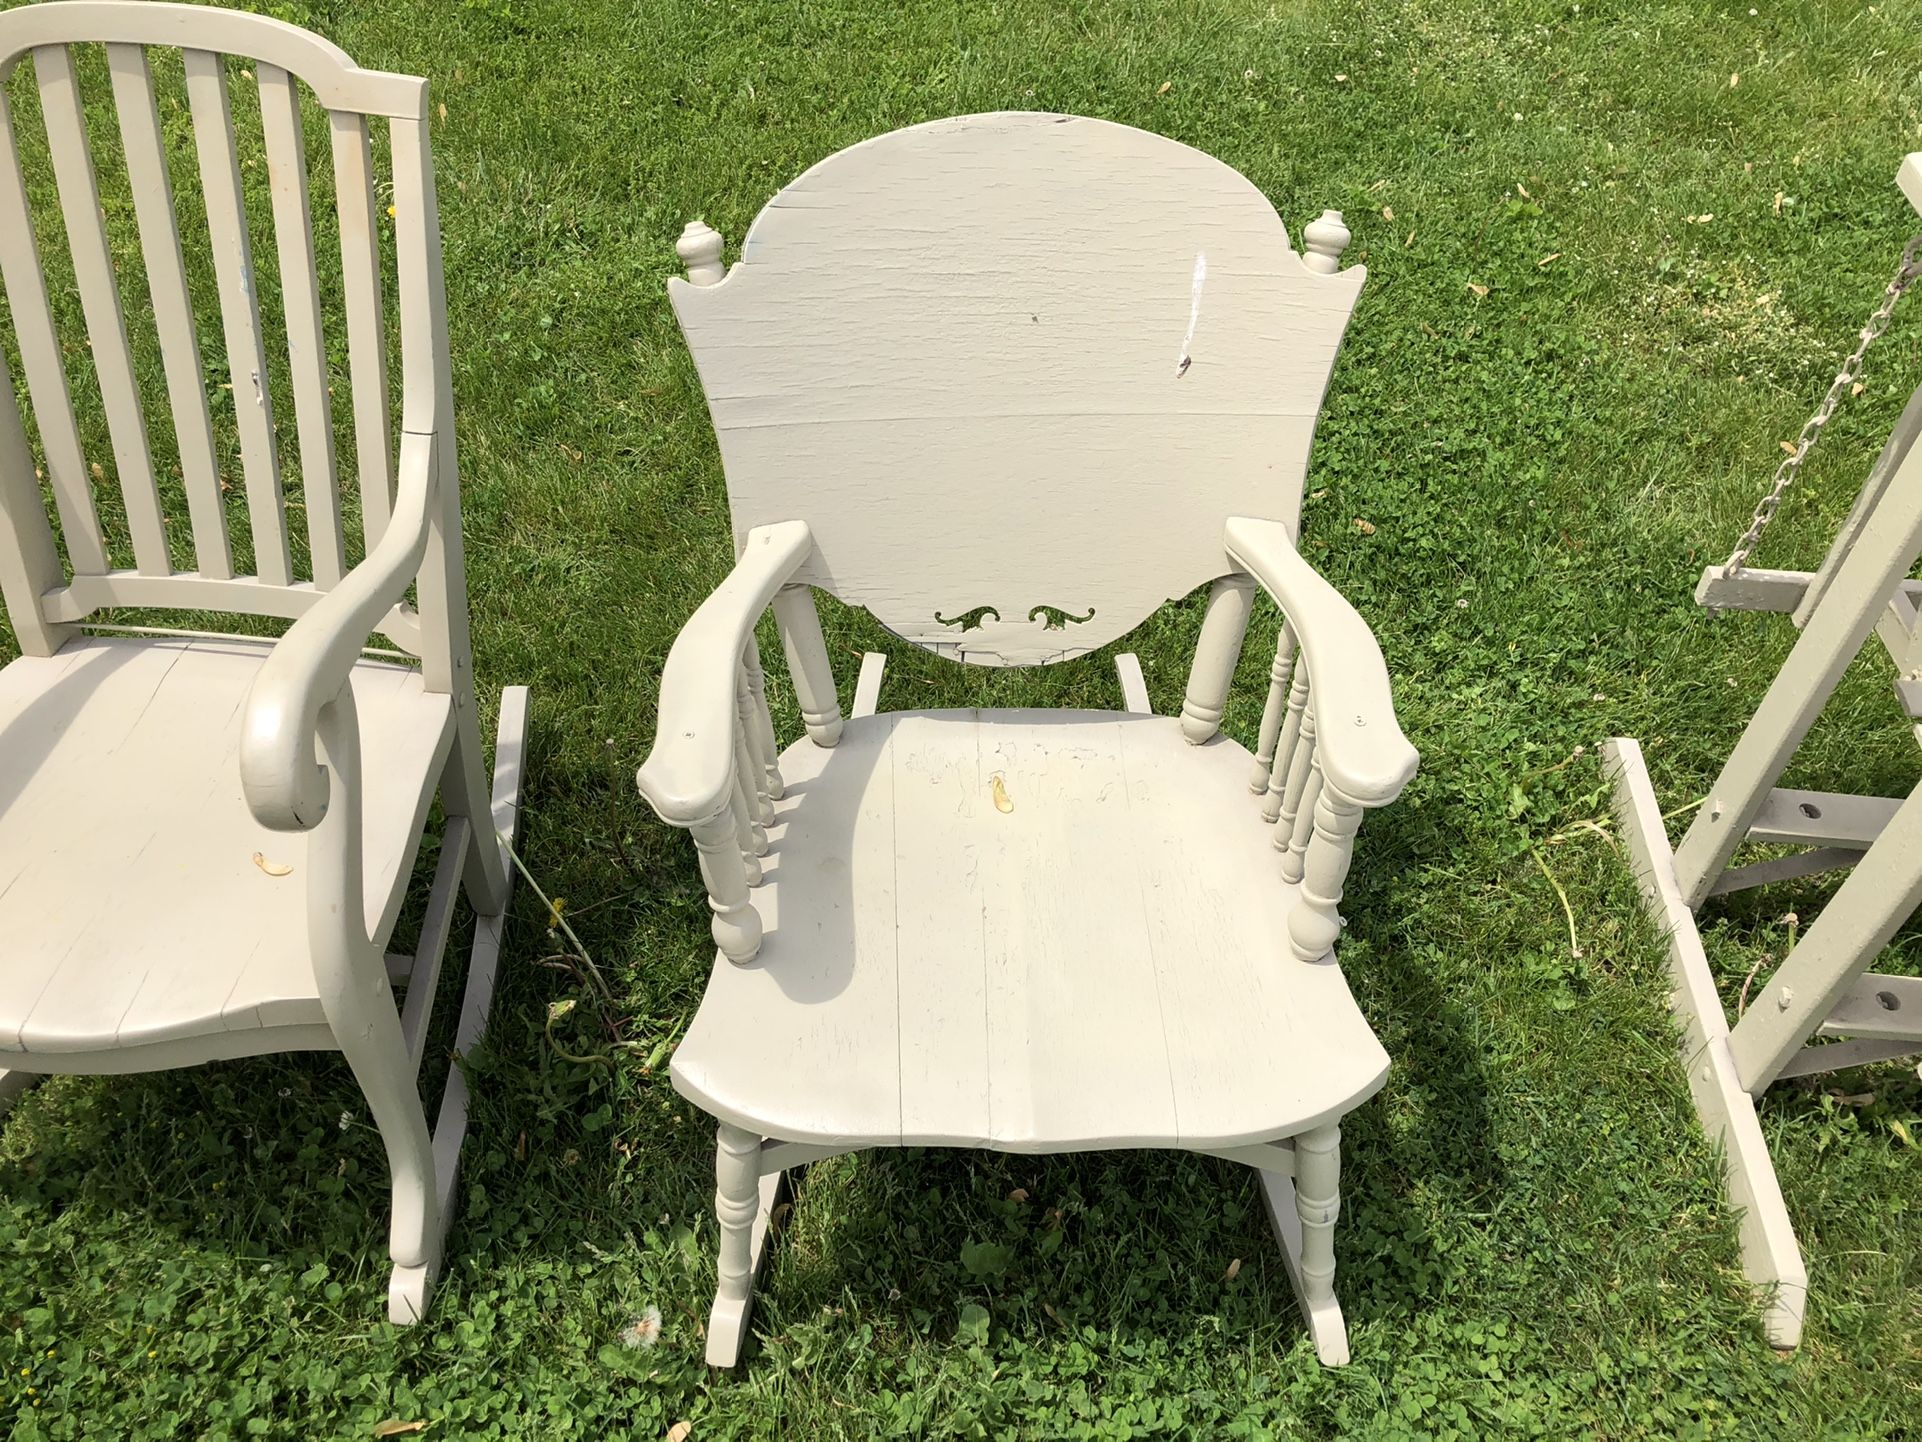 Antique Rocking Rocker Chair Home Deck Porch Or Patio Furniture